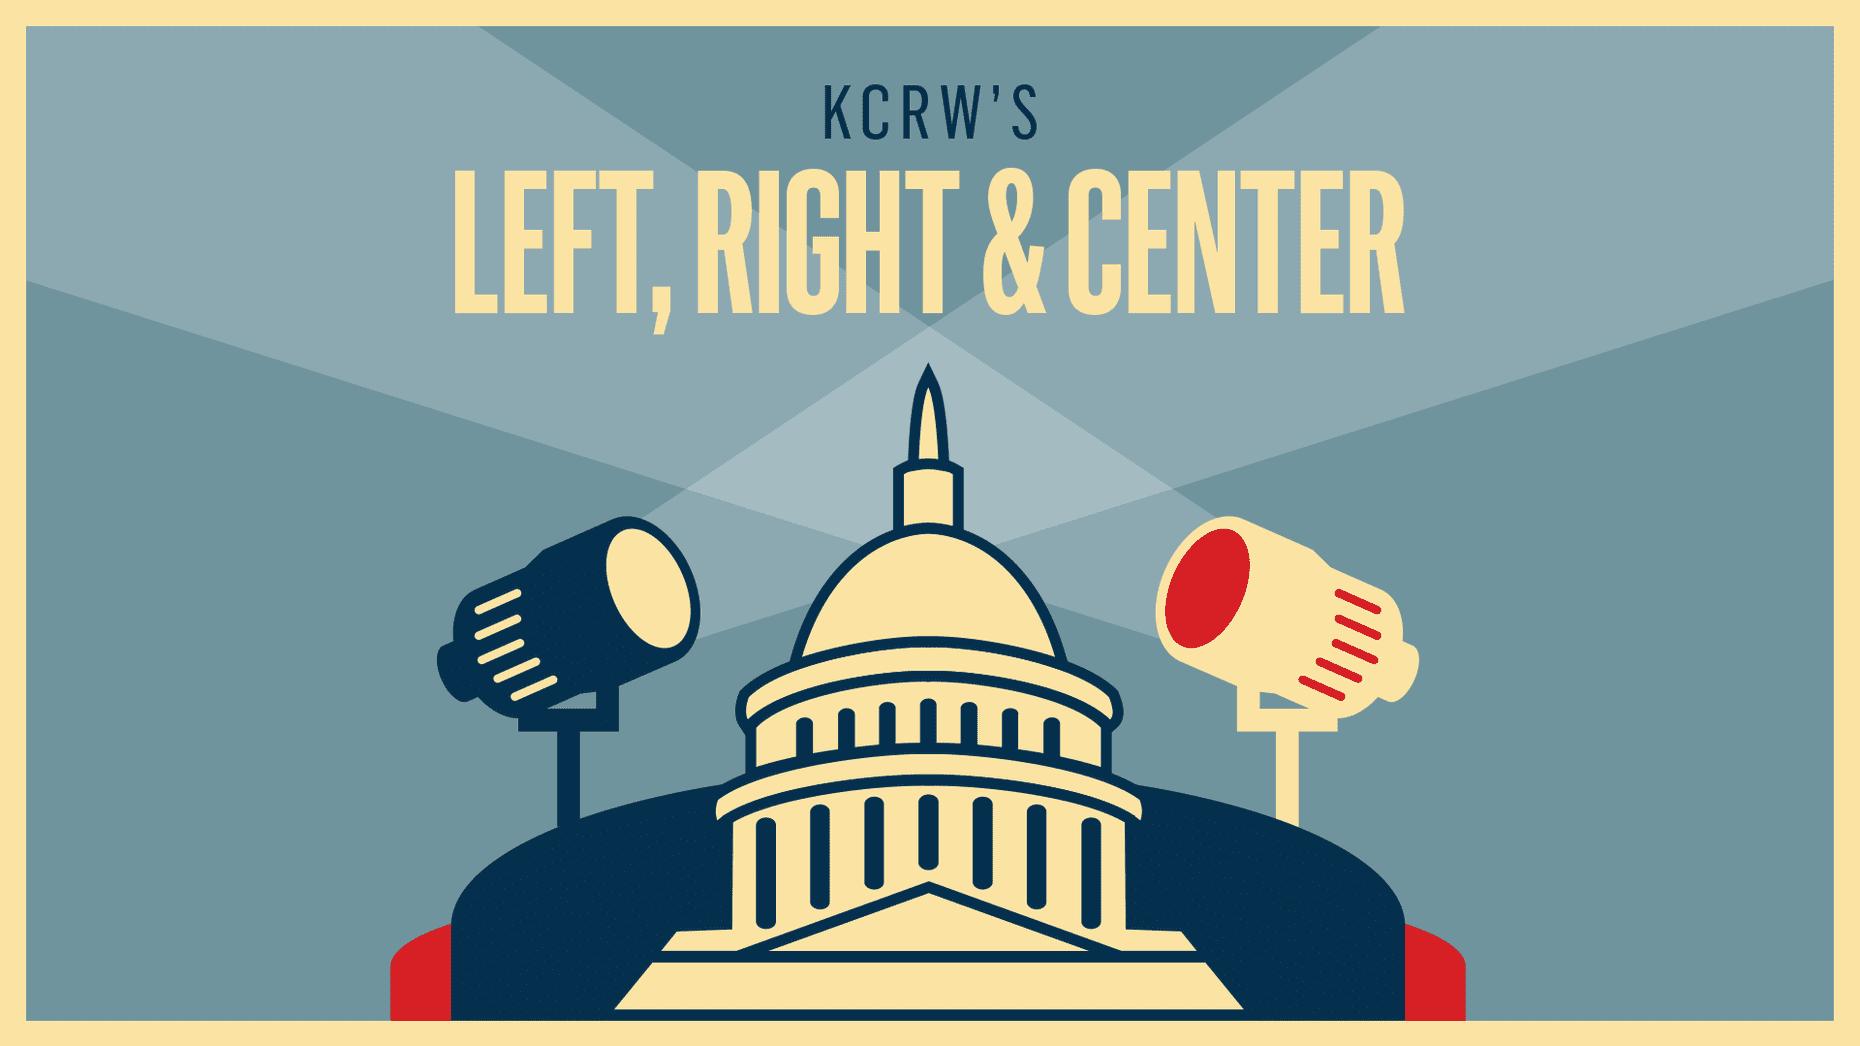 KCRW's Left, Right & Center Live from New York